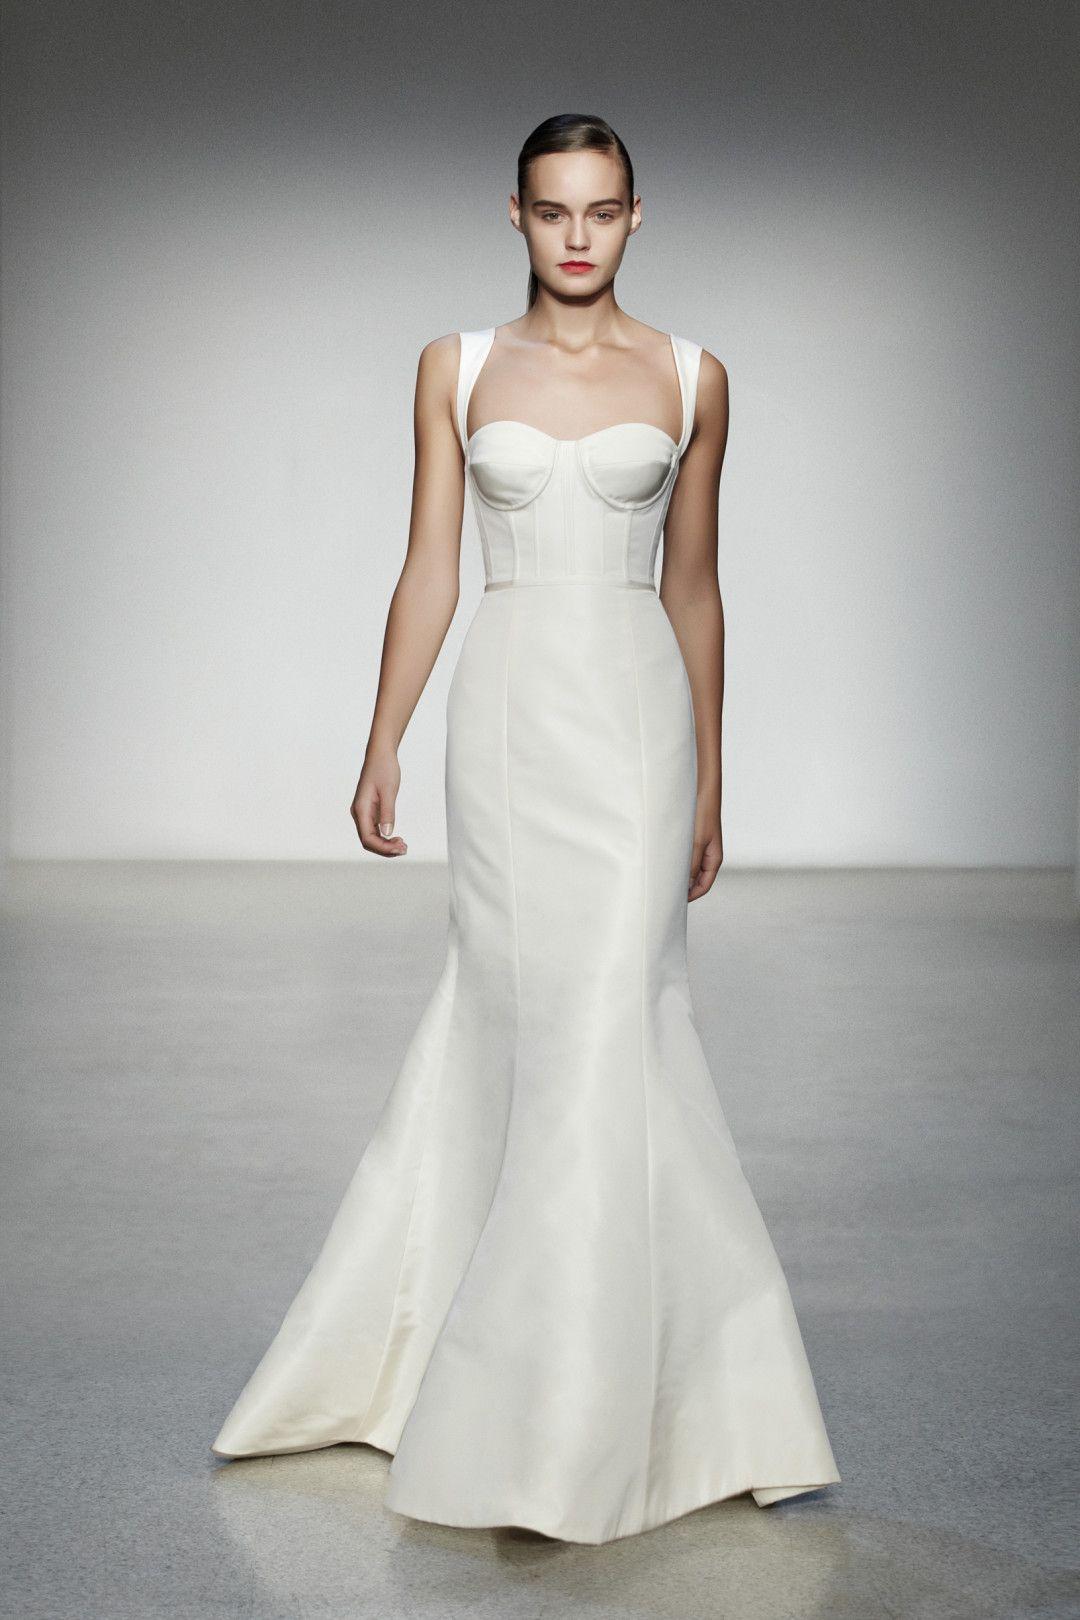 Priscilla of boston wedding dress  nolita  One day  Pinterest